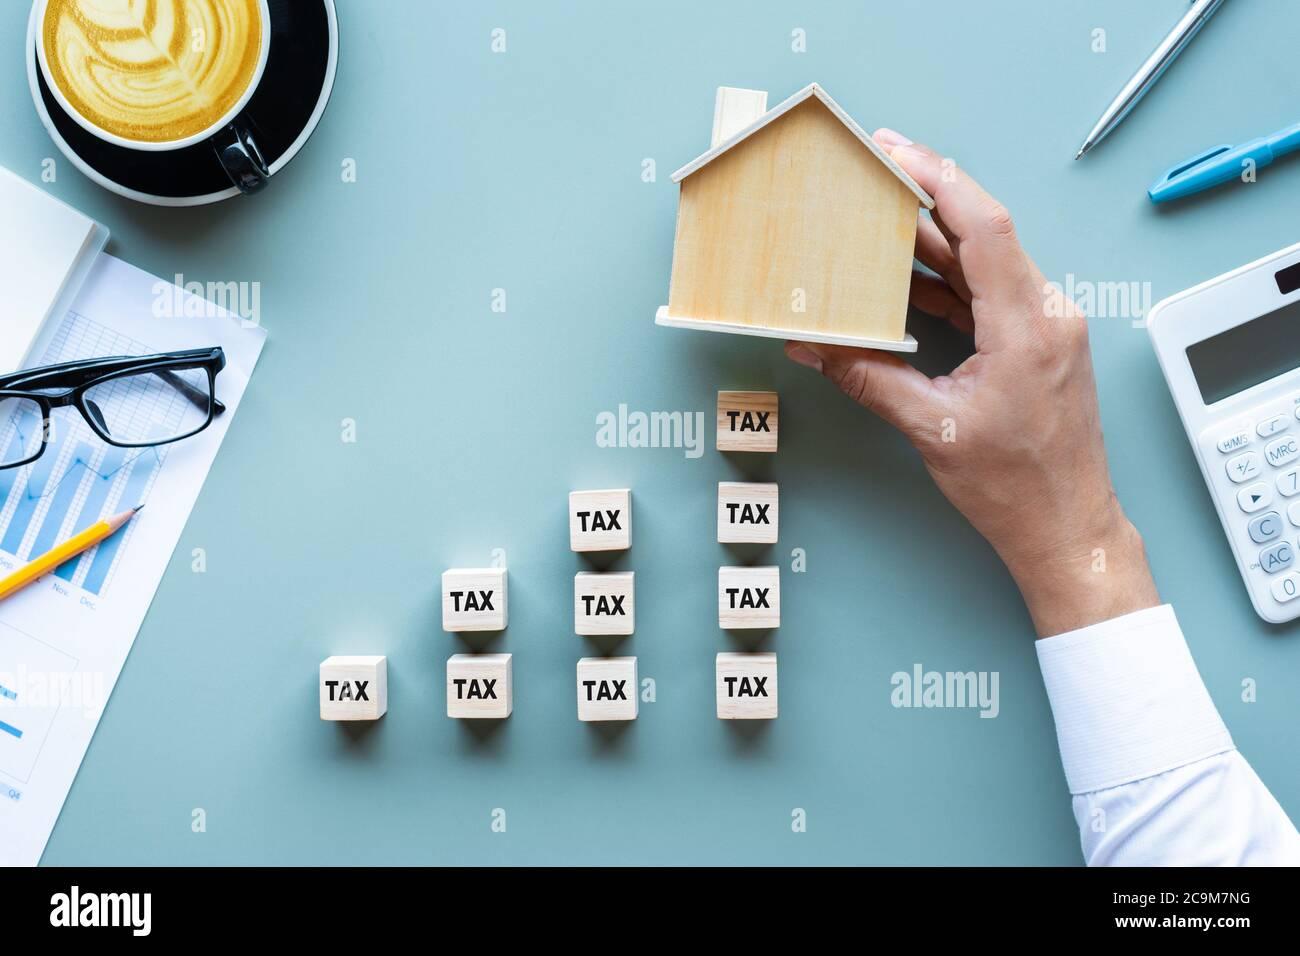 Propiedad tax.investment planning.business real estate.economy crisis.gastos de worker.rent or buy house.top view Foto de stock